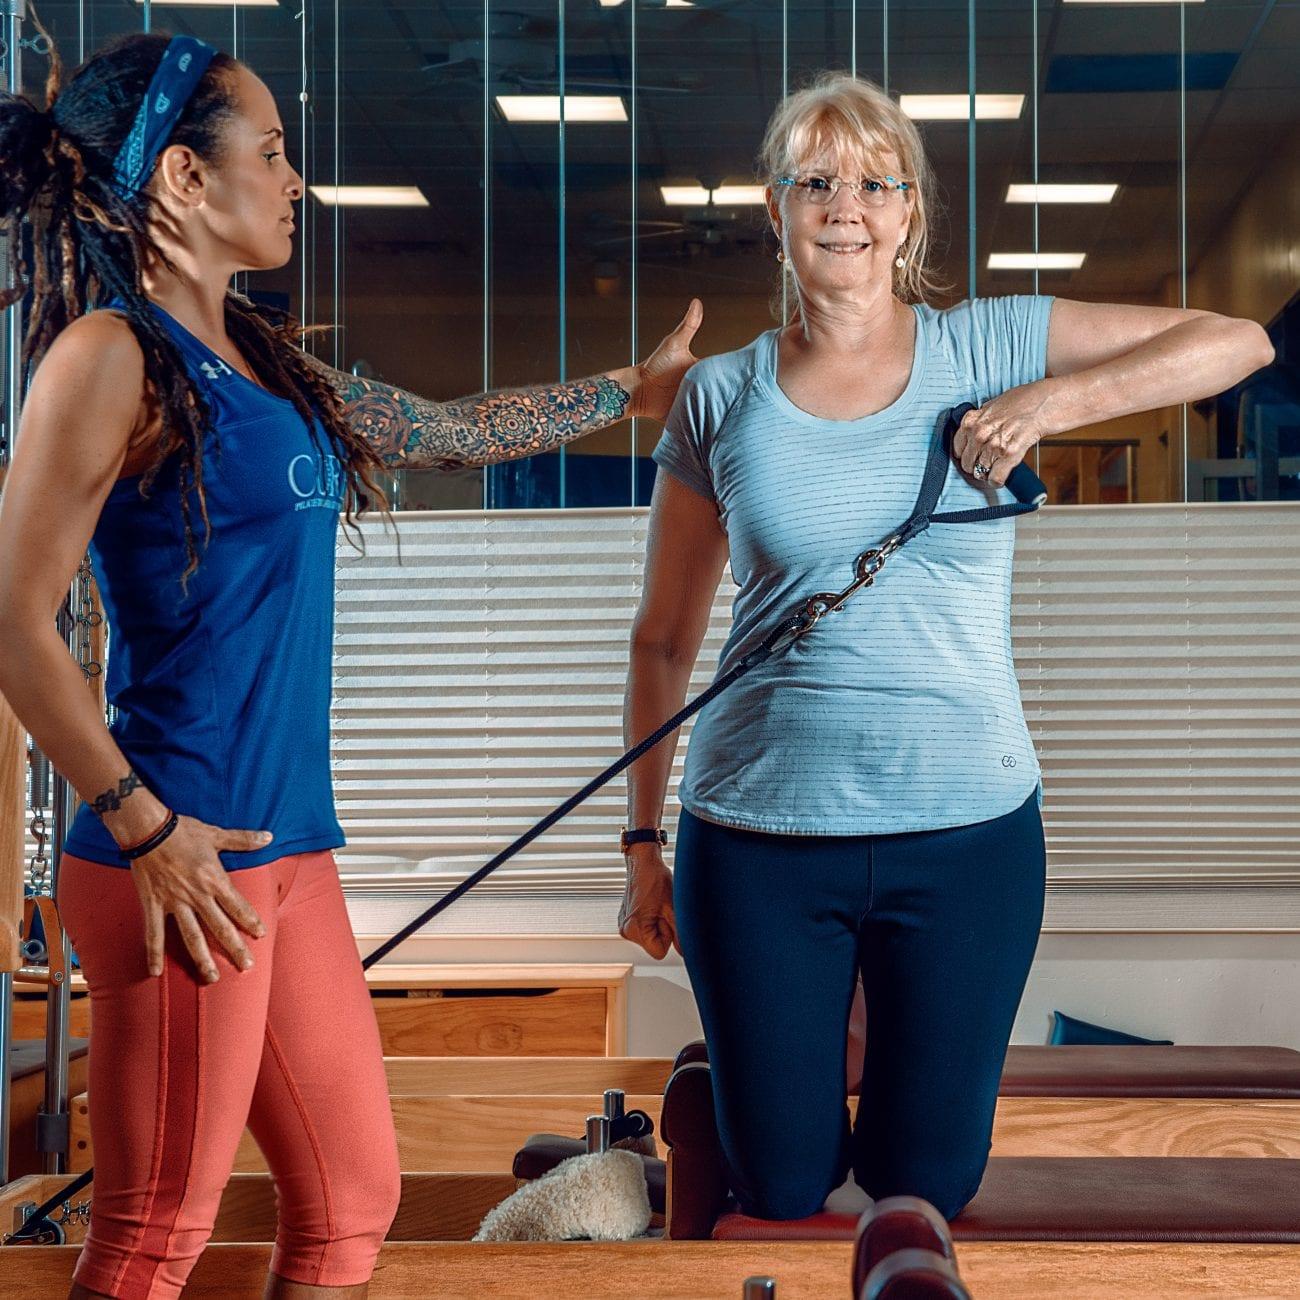 Senior Pilates classes in Cherry Hill